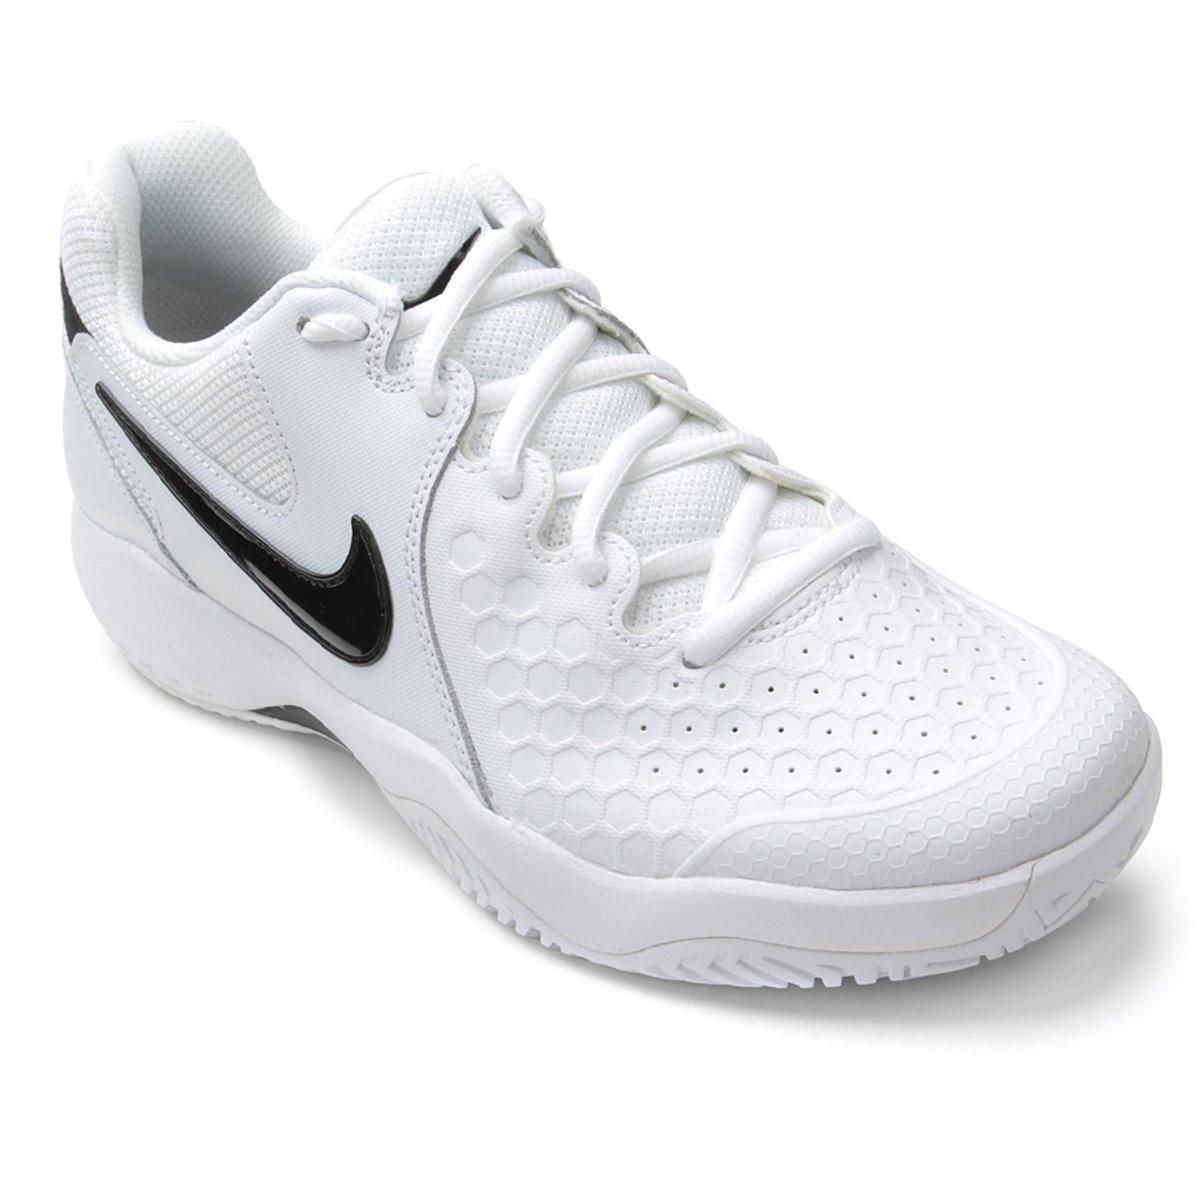 Tênis Nike Air Zoom Couro Resistance Masculino Branco E Preto